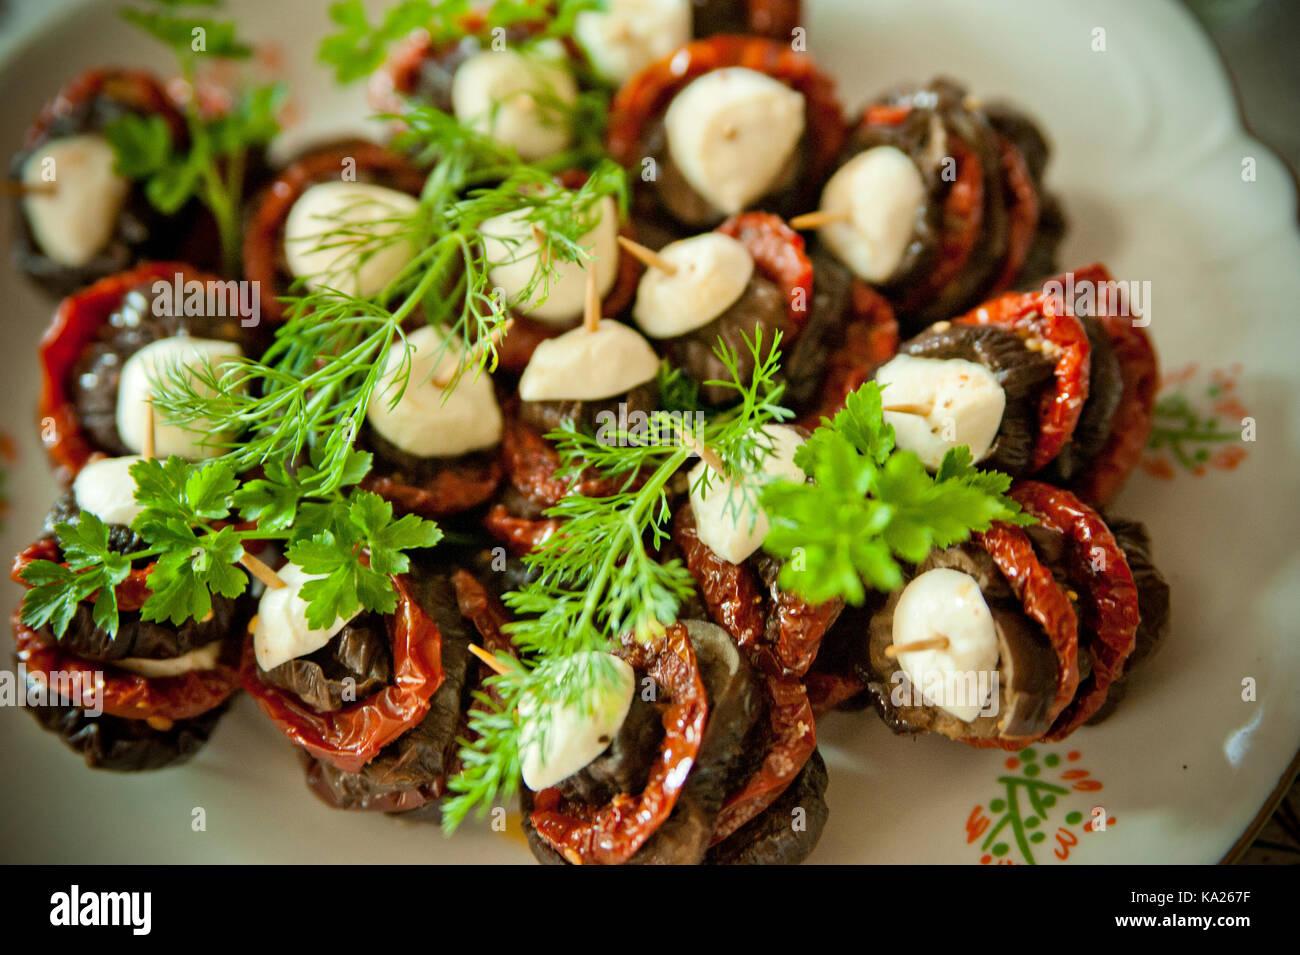 Aubergine and salami stacks forecast